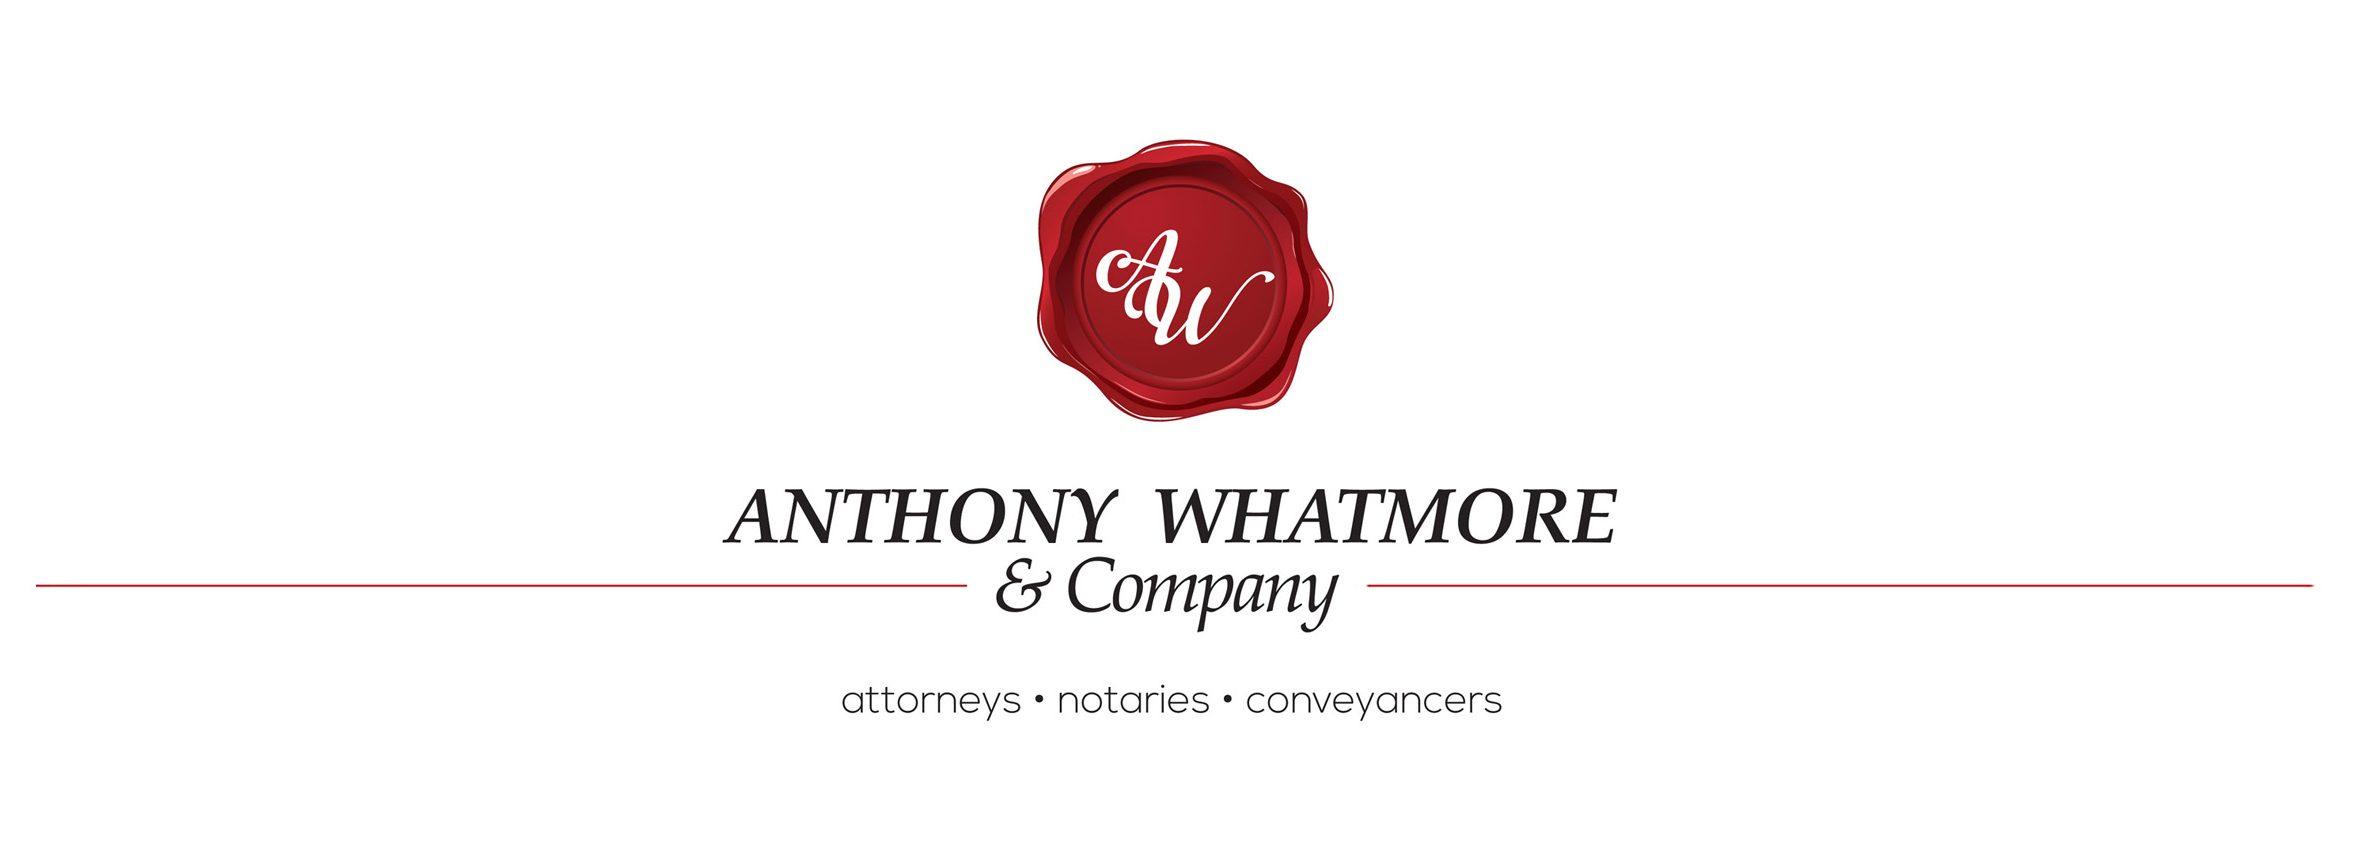 Anthony Whatmore & Company